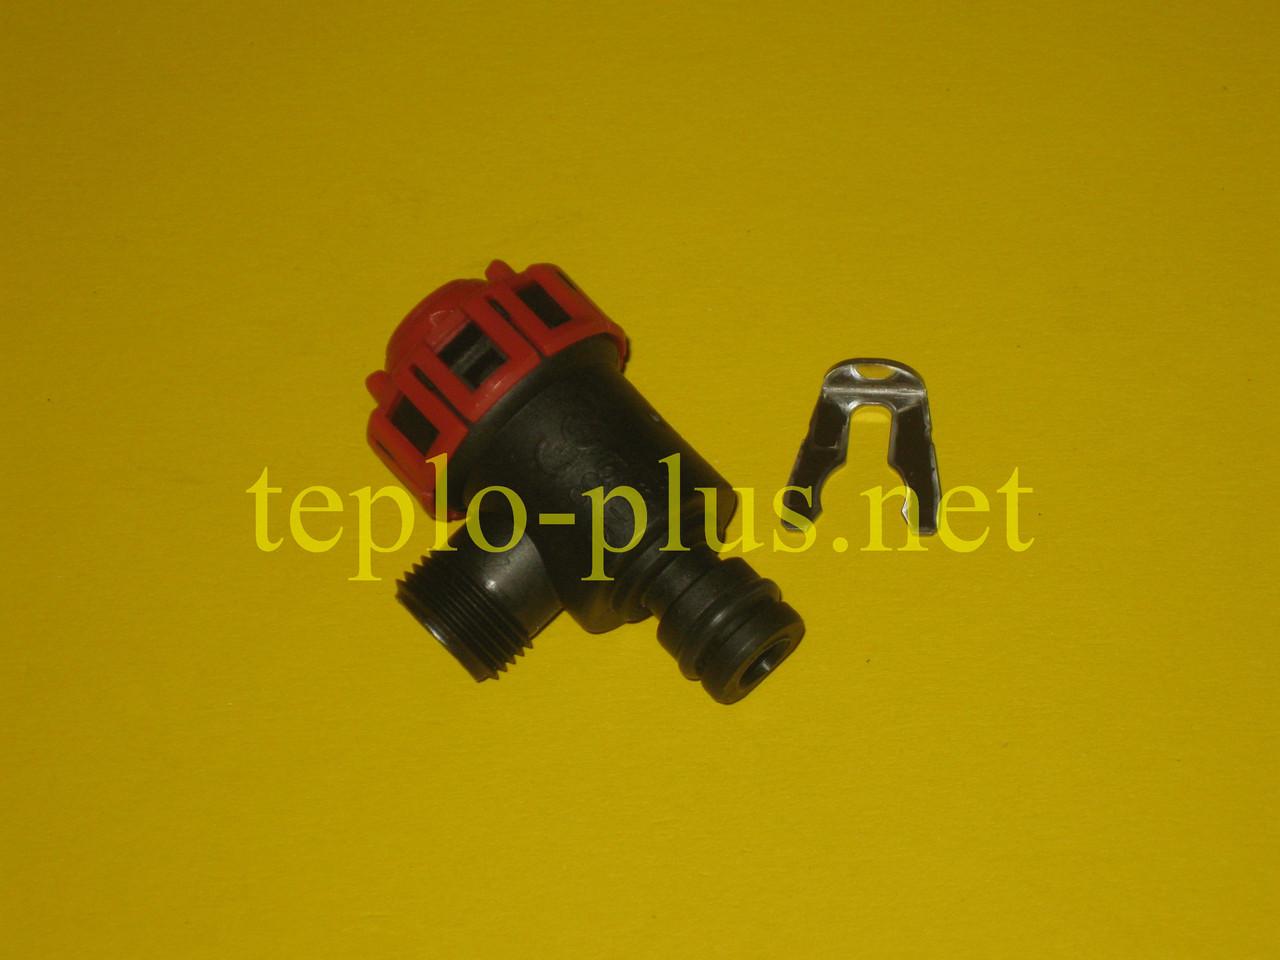 Предохранительный клапан 3 бар (клапан безопасности) 8718644566 Bosch Gaz 6000 W WBN6000-18(24)C RN